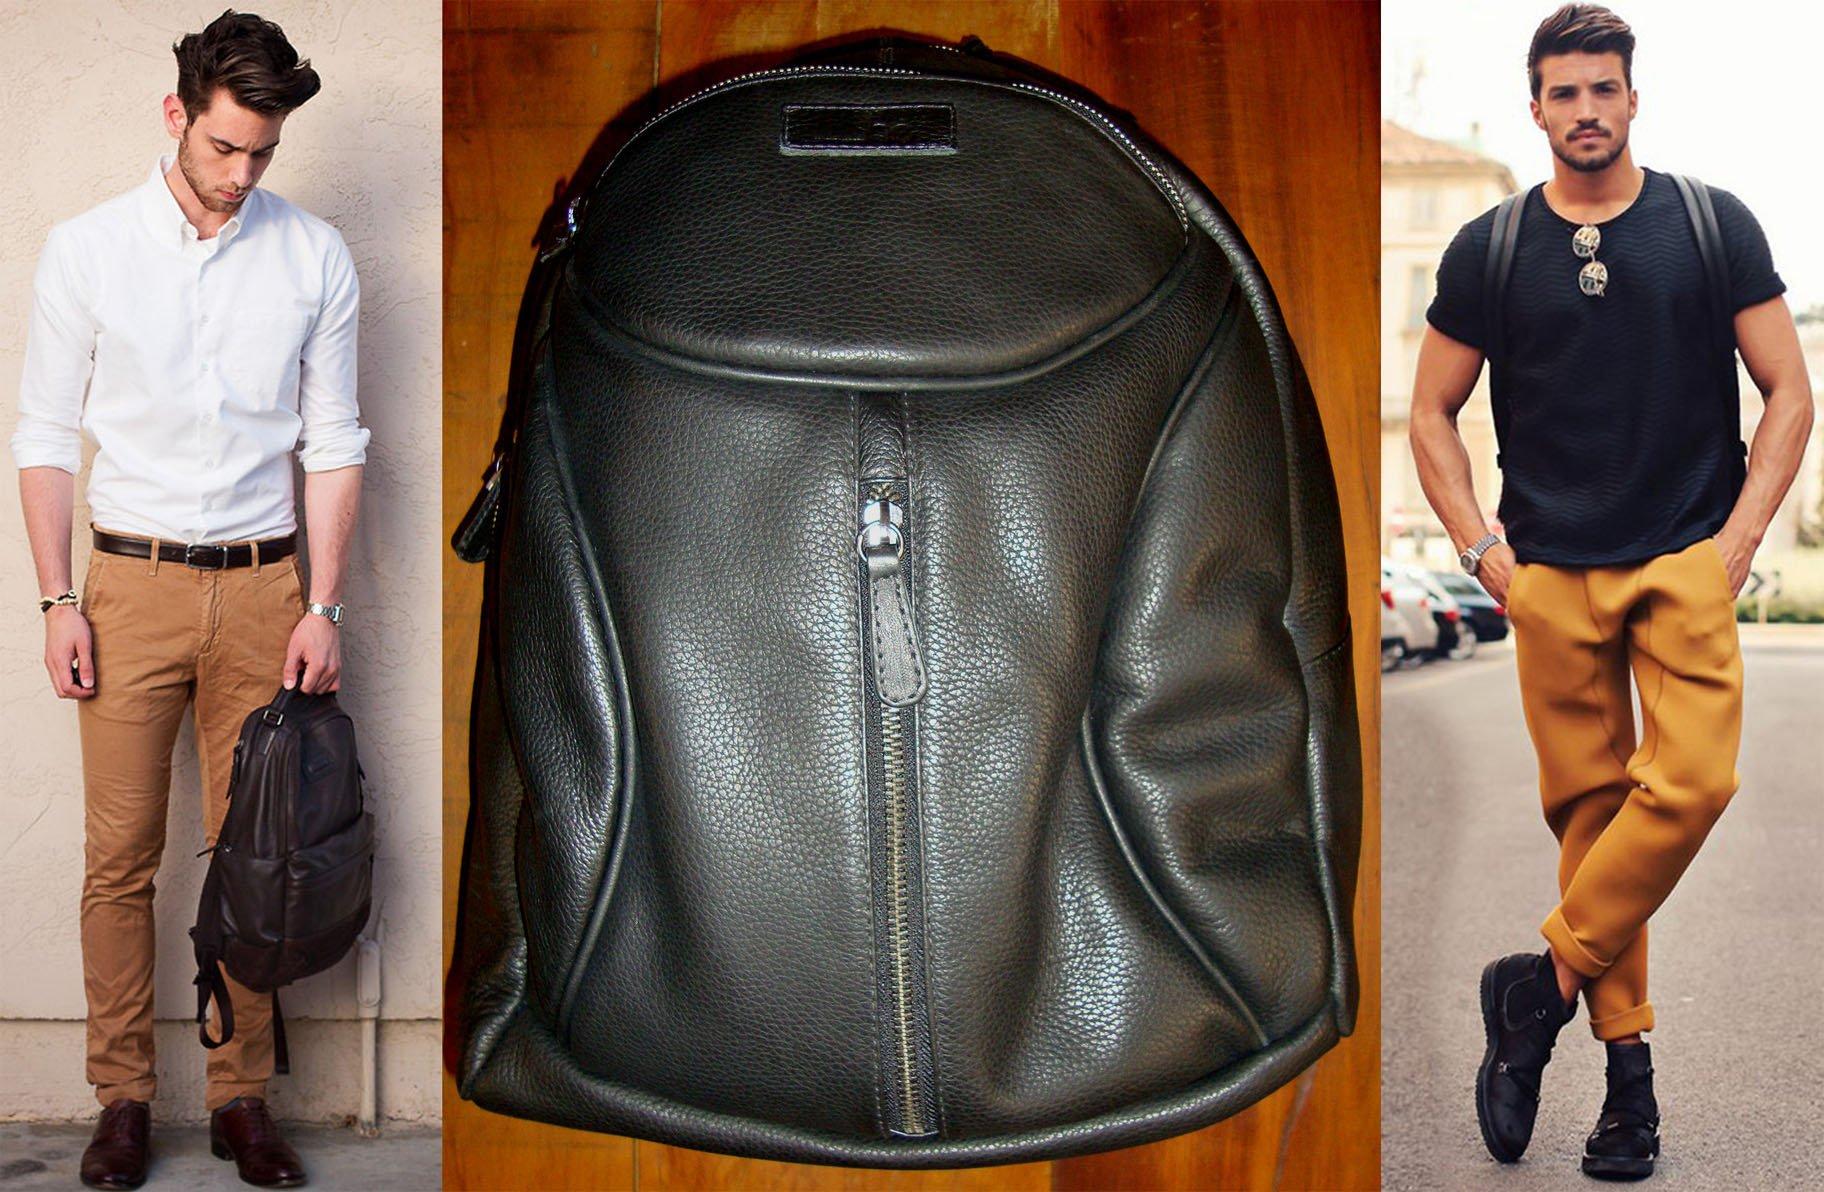 bolsa masculina mochila de costas homens que se cuidam